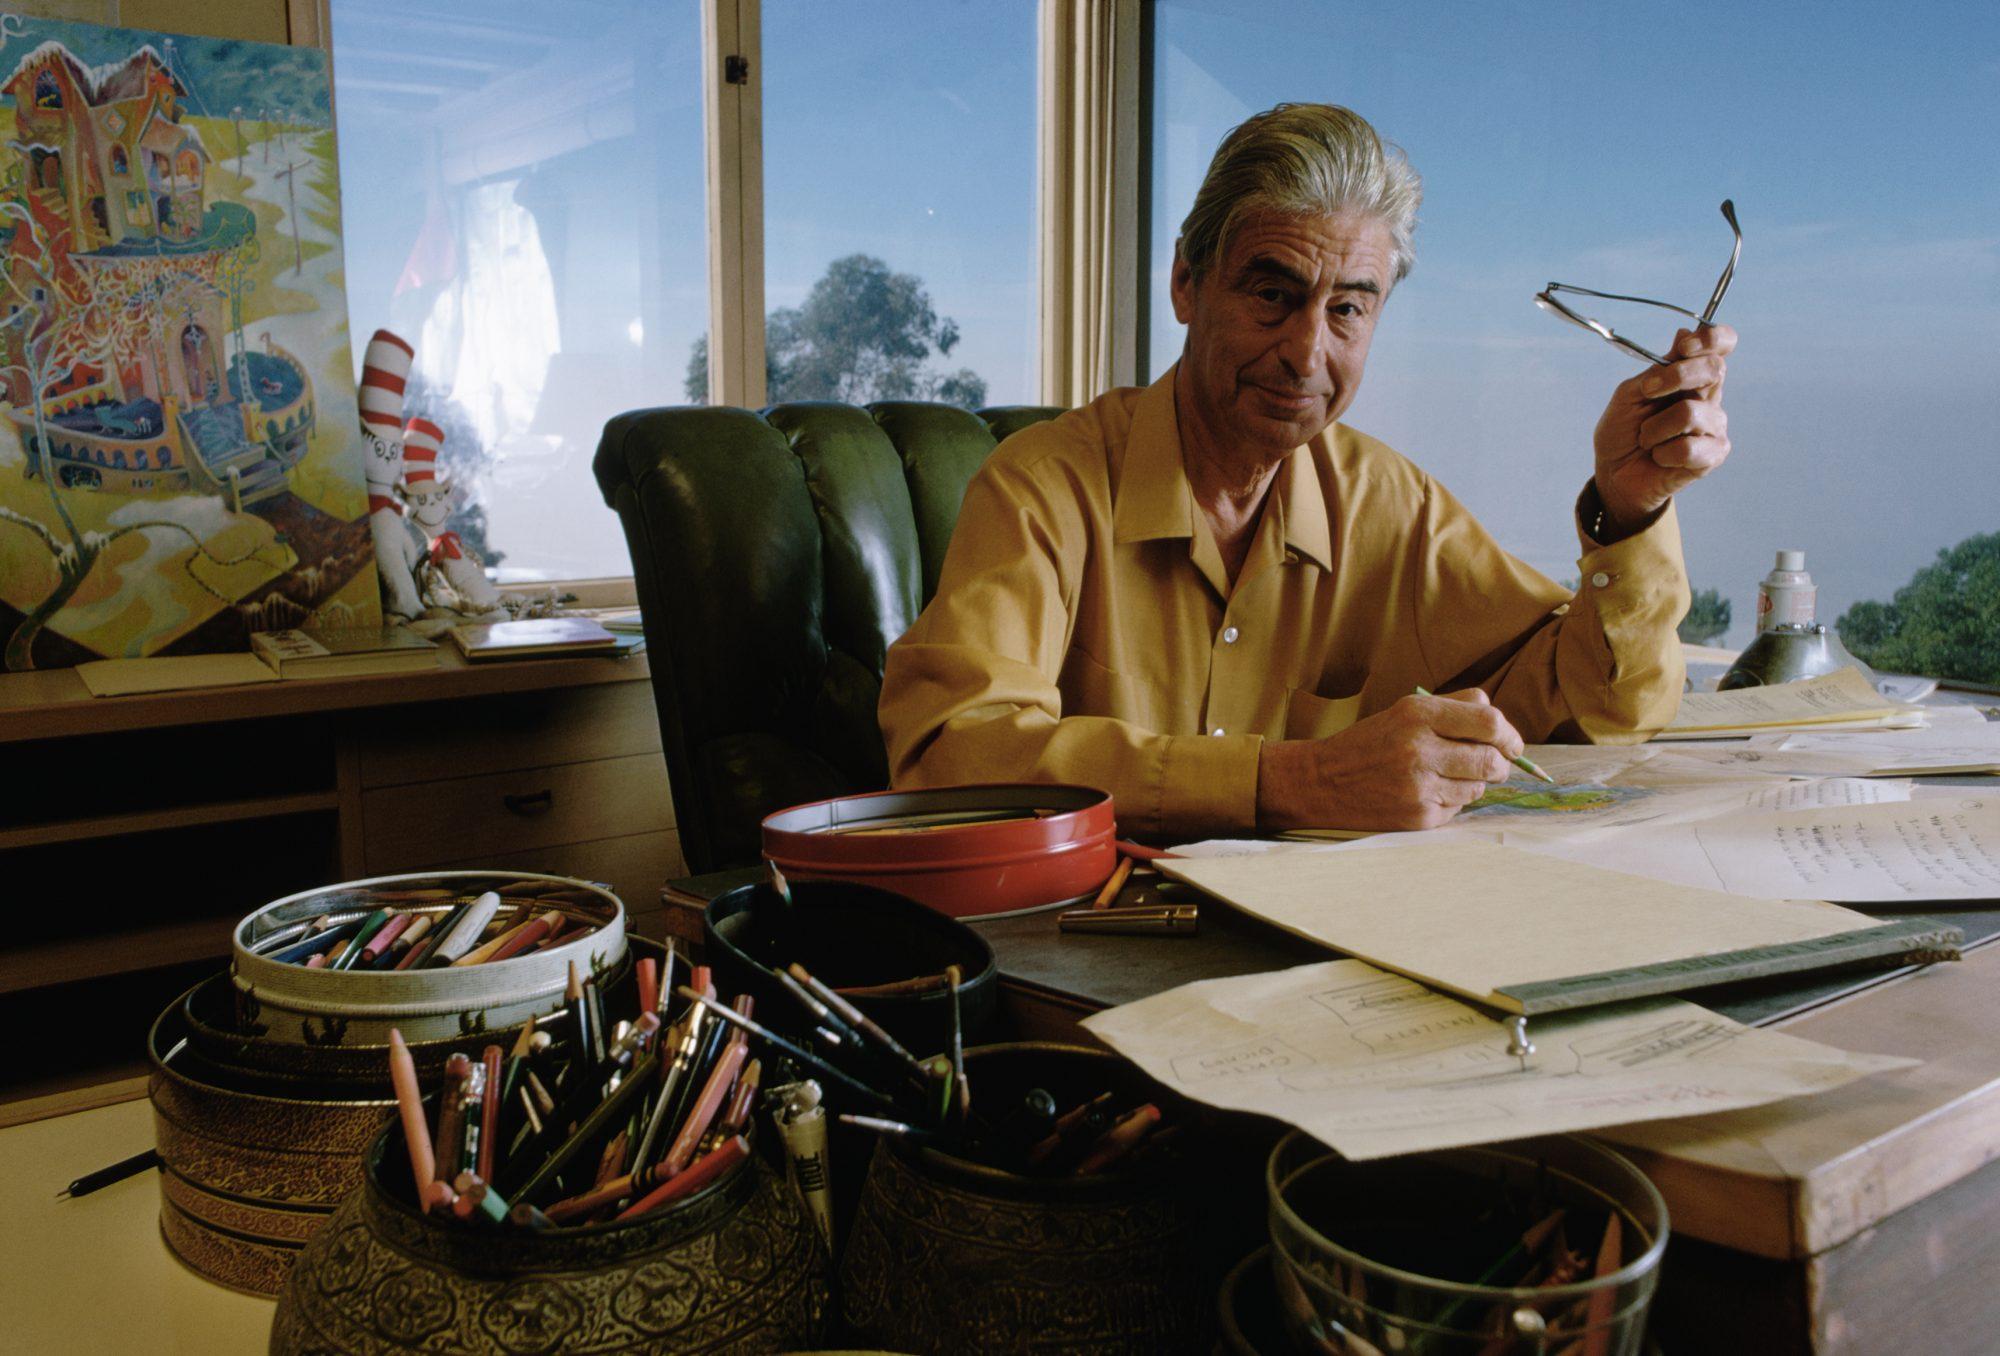 dr-seuss-at-desk.jpg